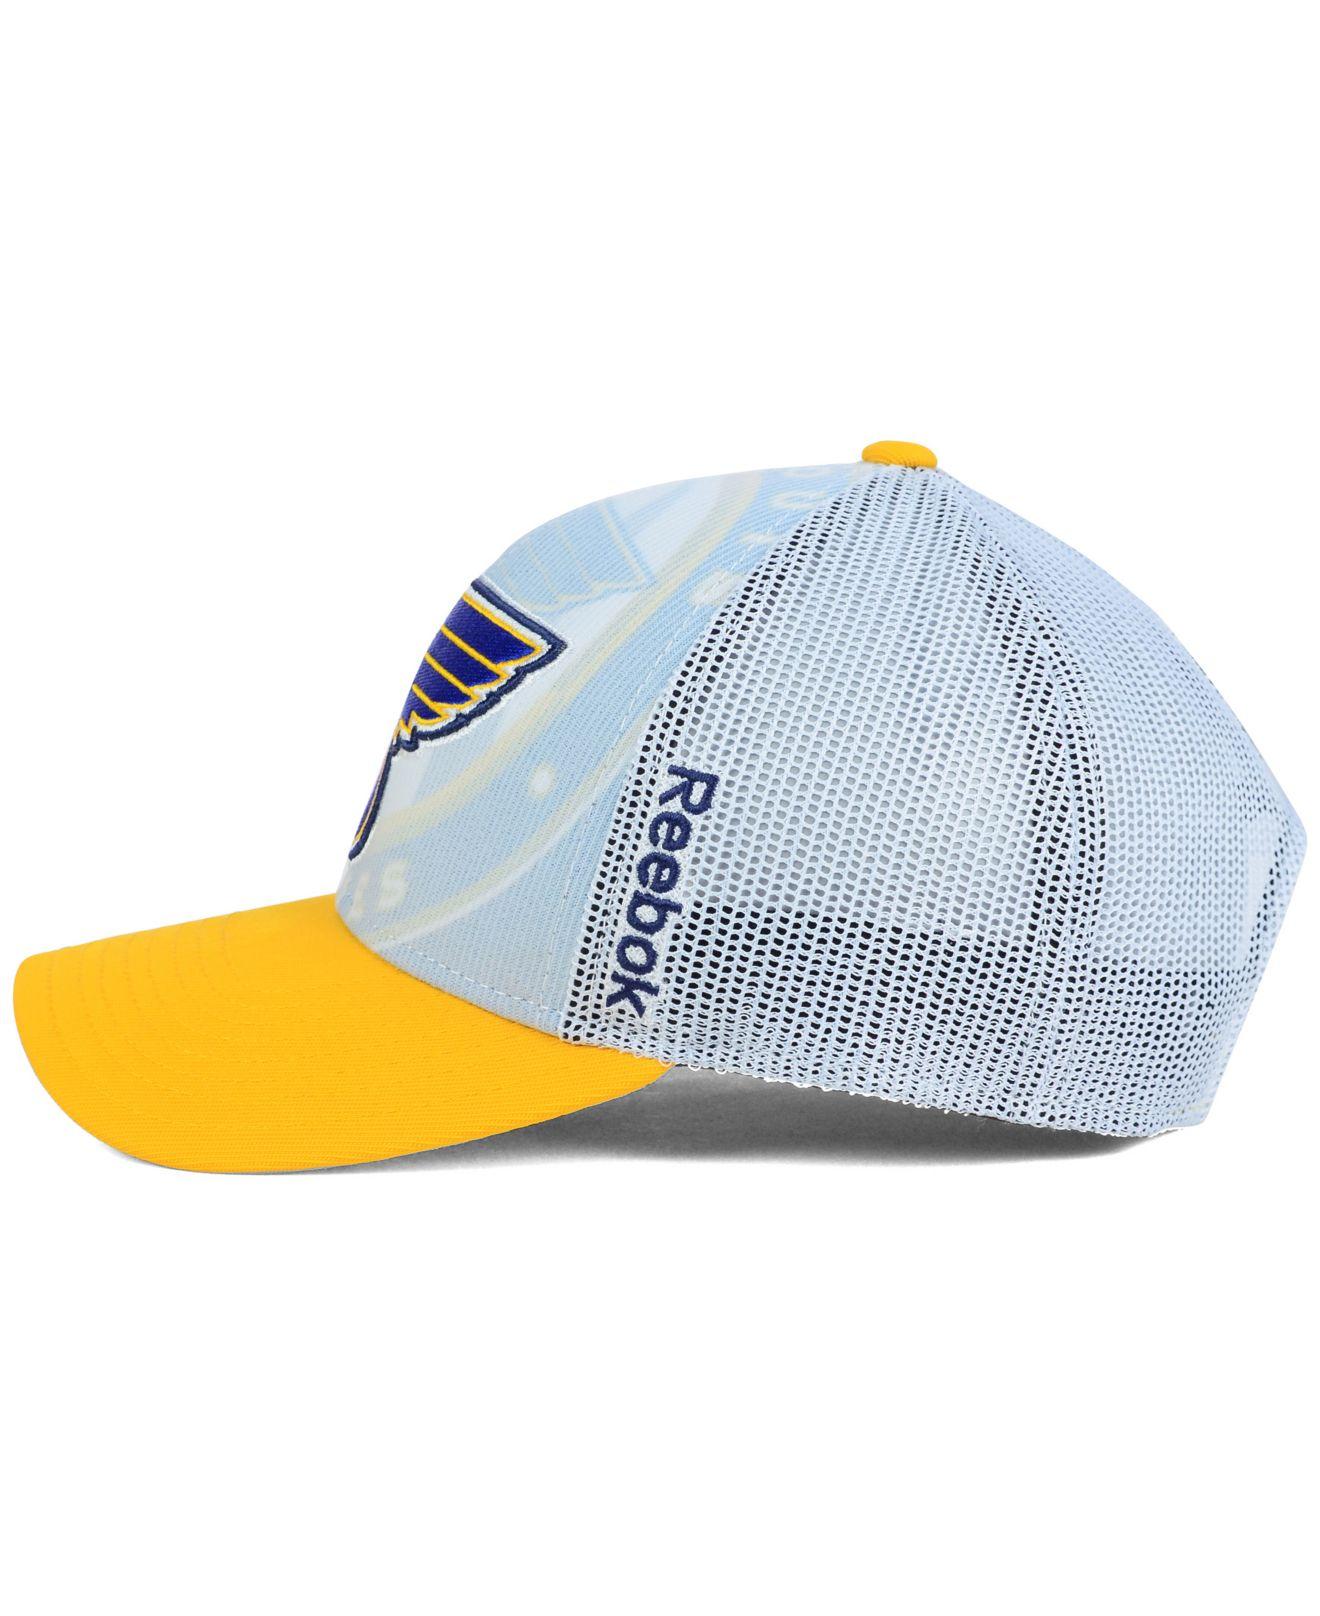 online store fc39c 5cfbe ... sale lyst reebok st. louis blues secondary draft cap in blue for men  87833 e7004